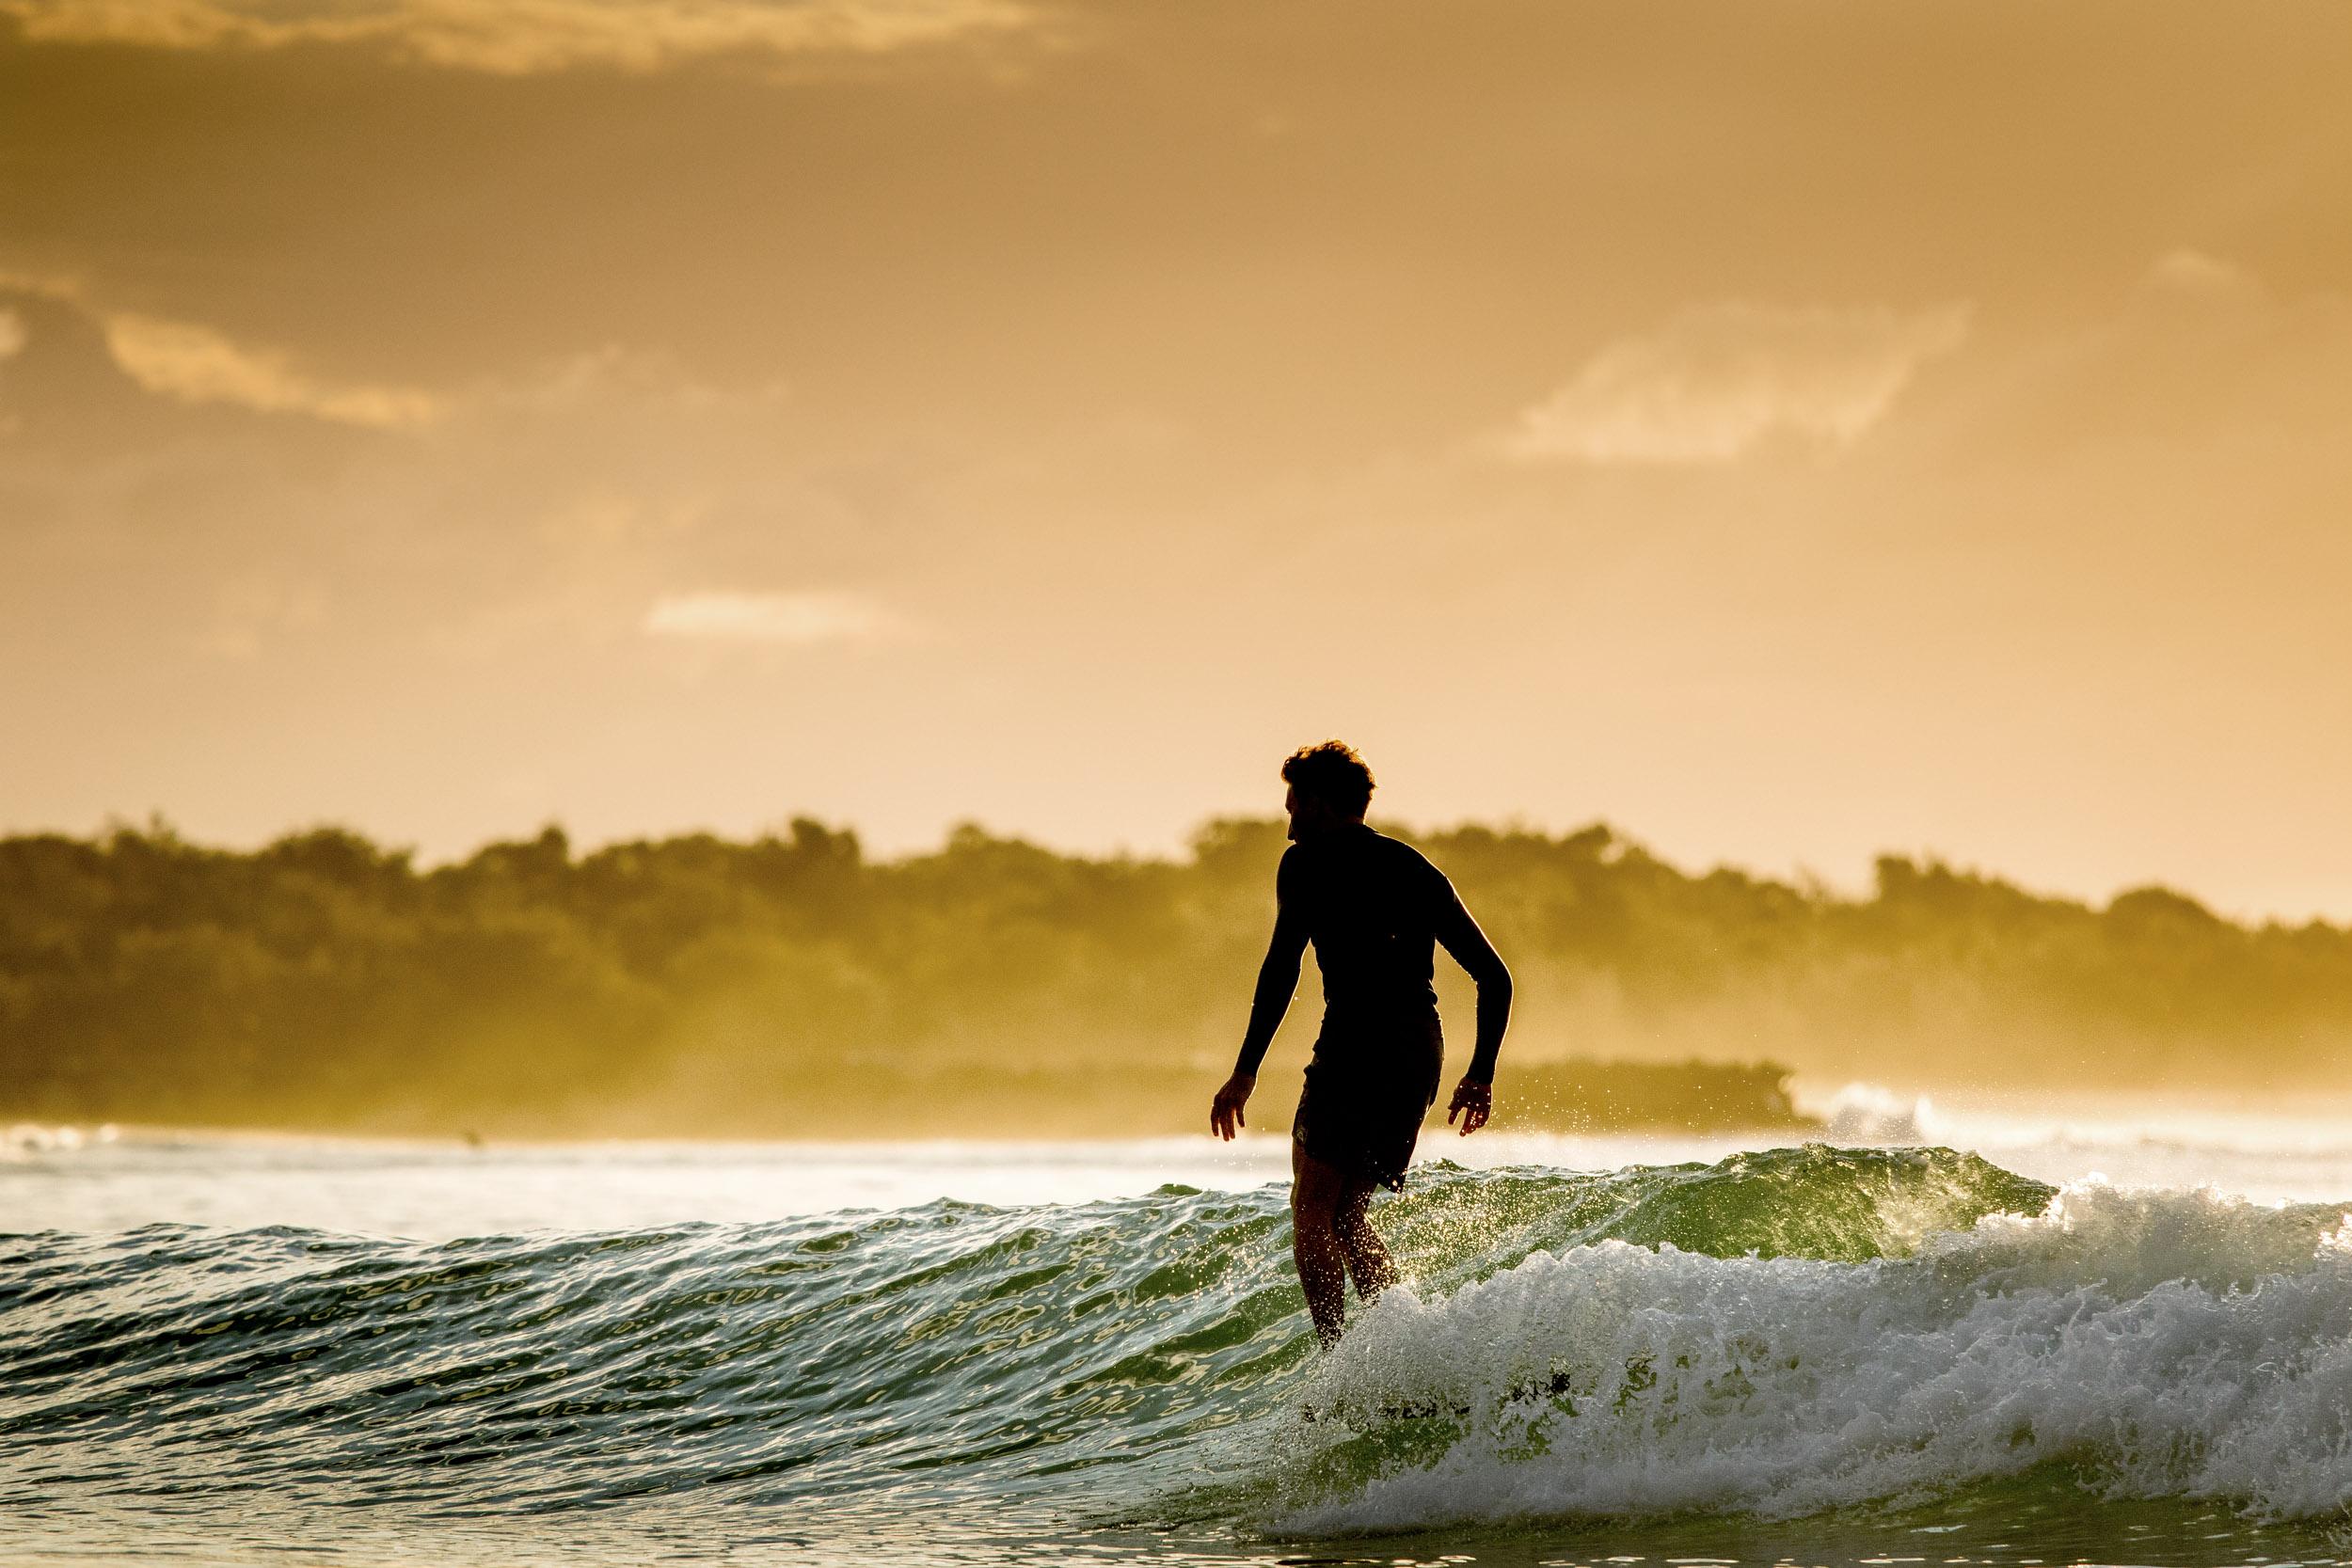 longboarding-first-point-matt-cuddihy.jpg